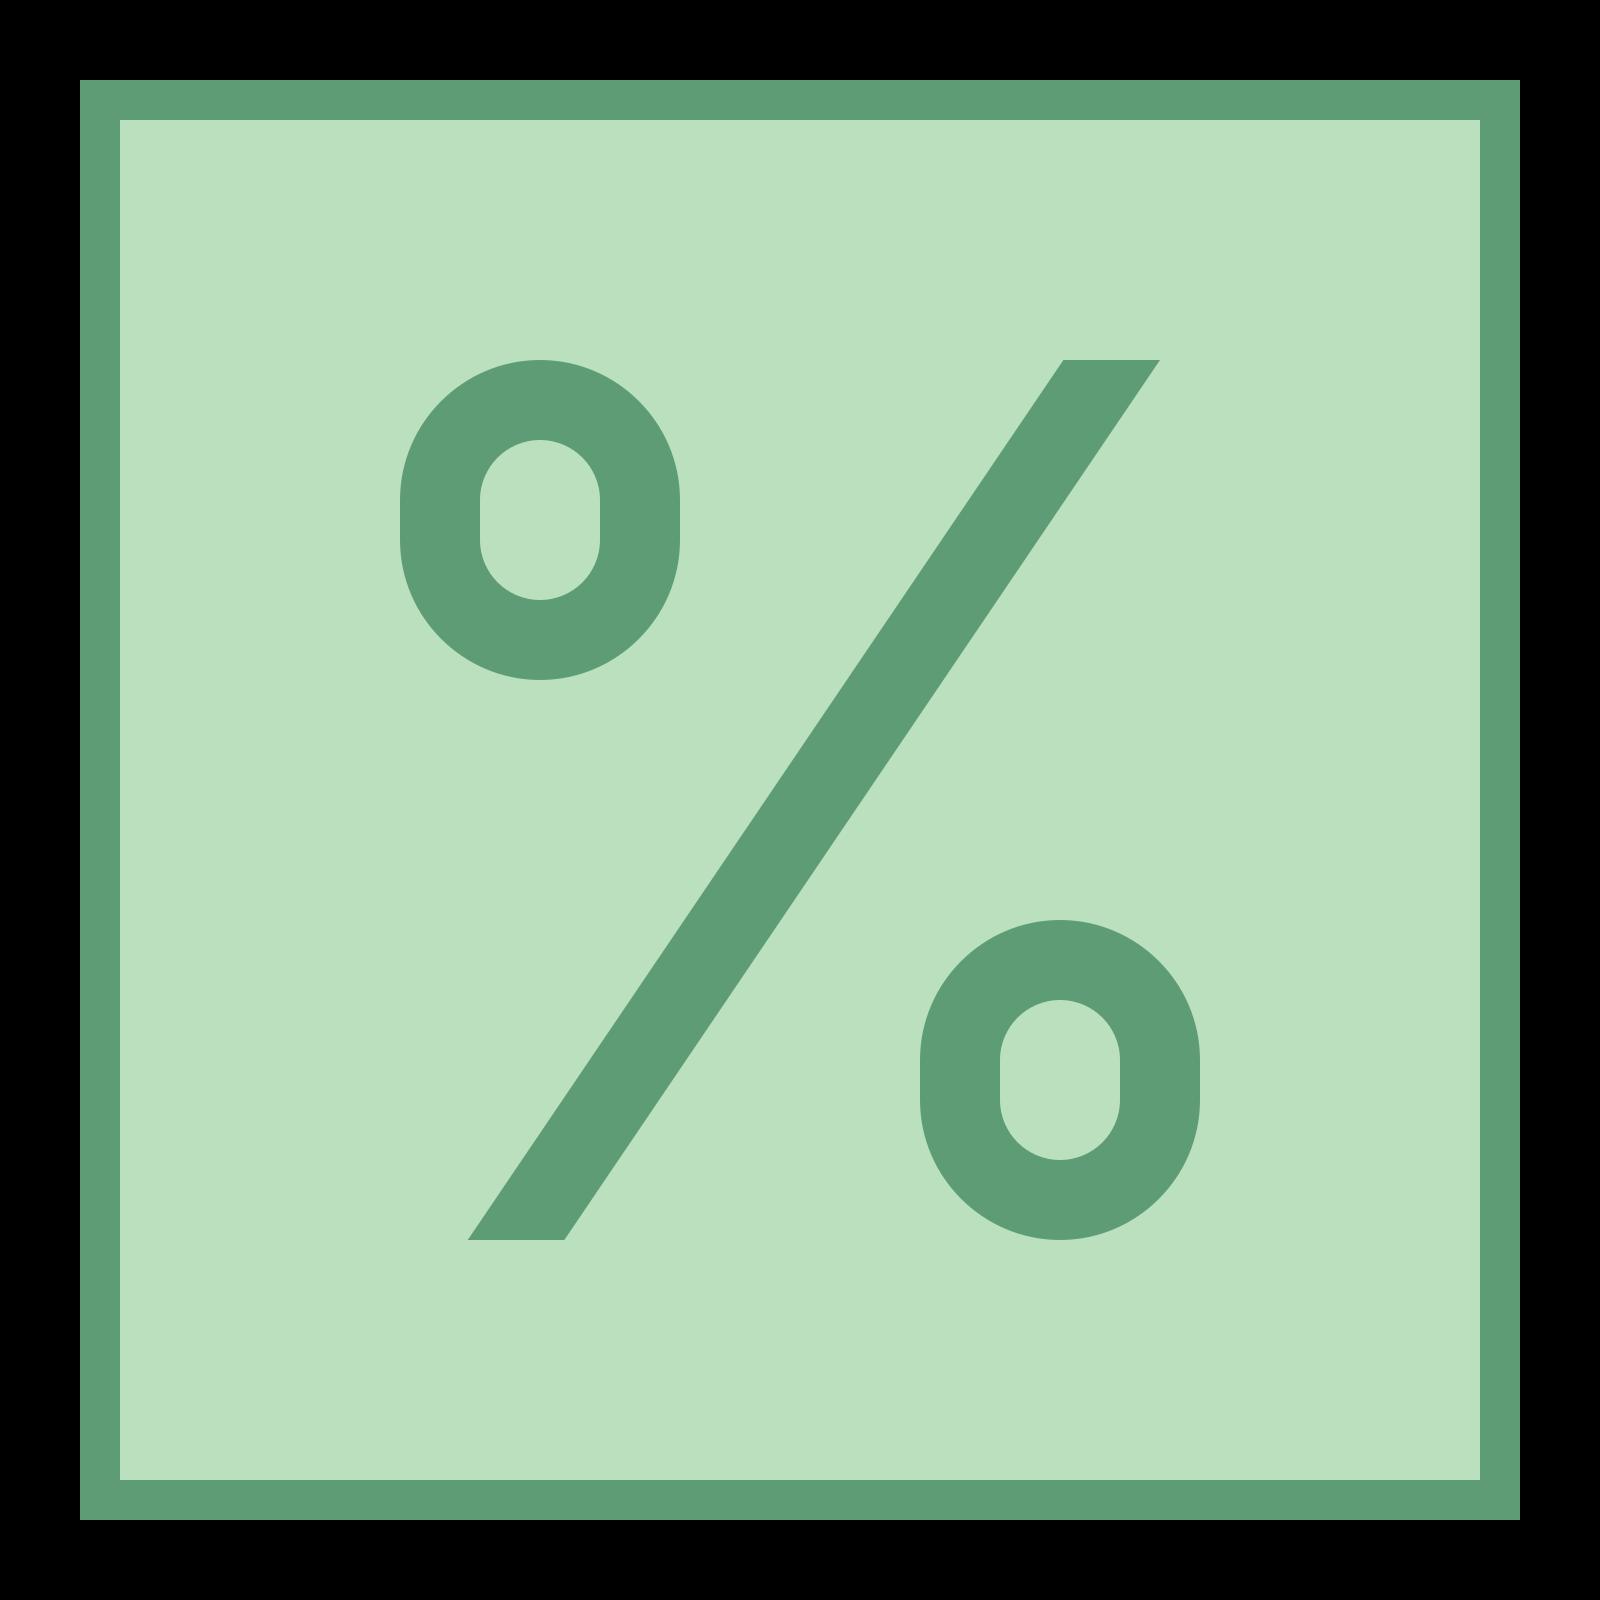 Procent 2 icon